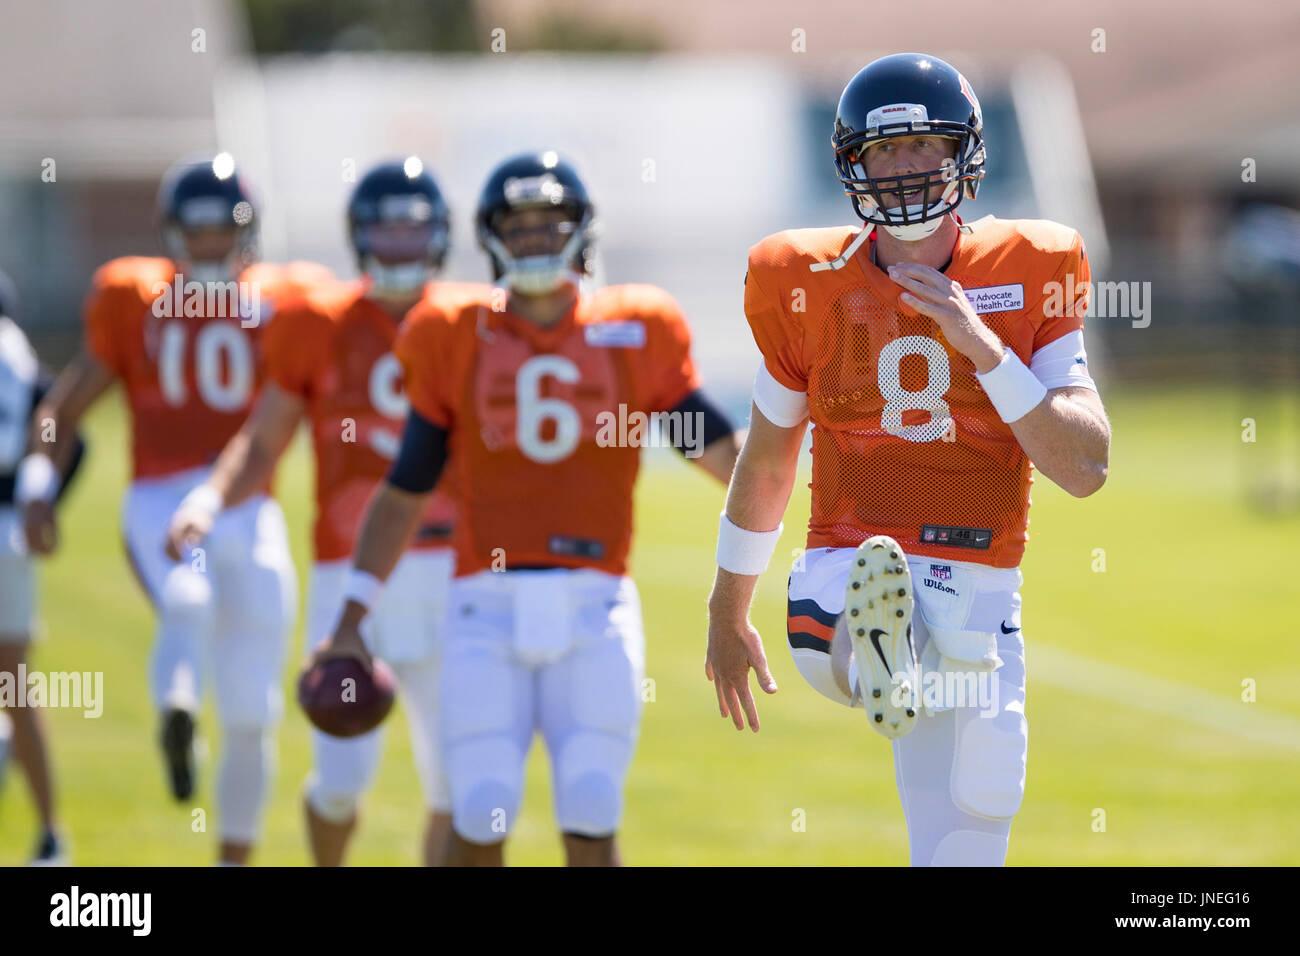 0f16fbdc8ce15b Bourbonnais, Illinois, USA. 29th July, 2017. - Chicago Bears Quarterback #